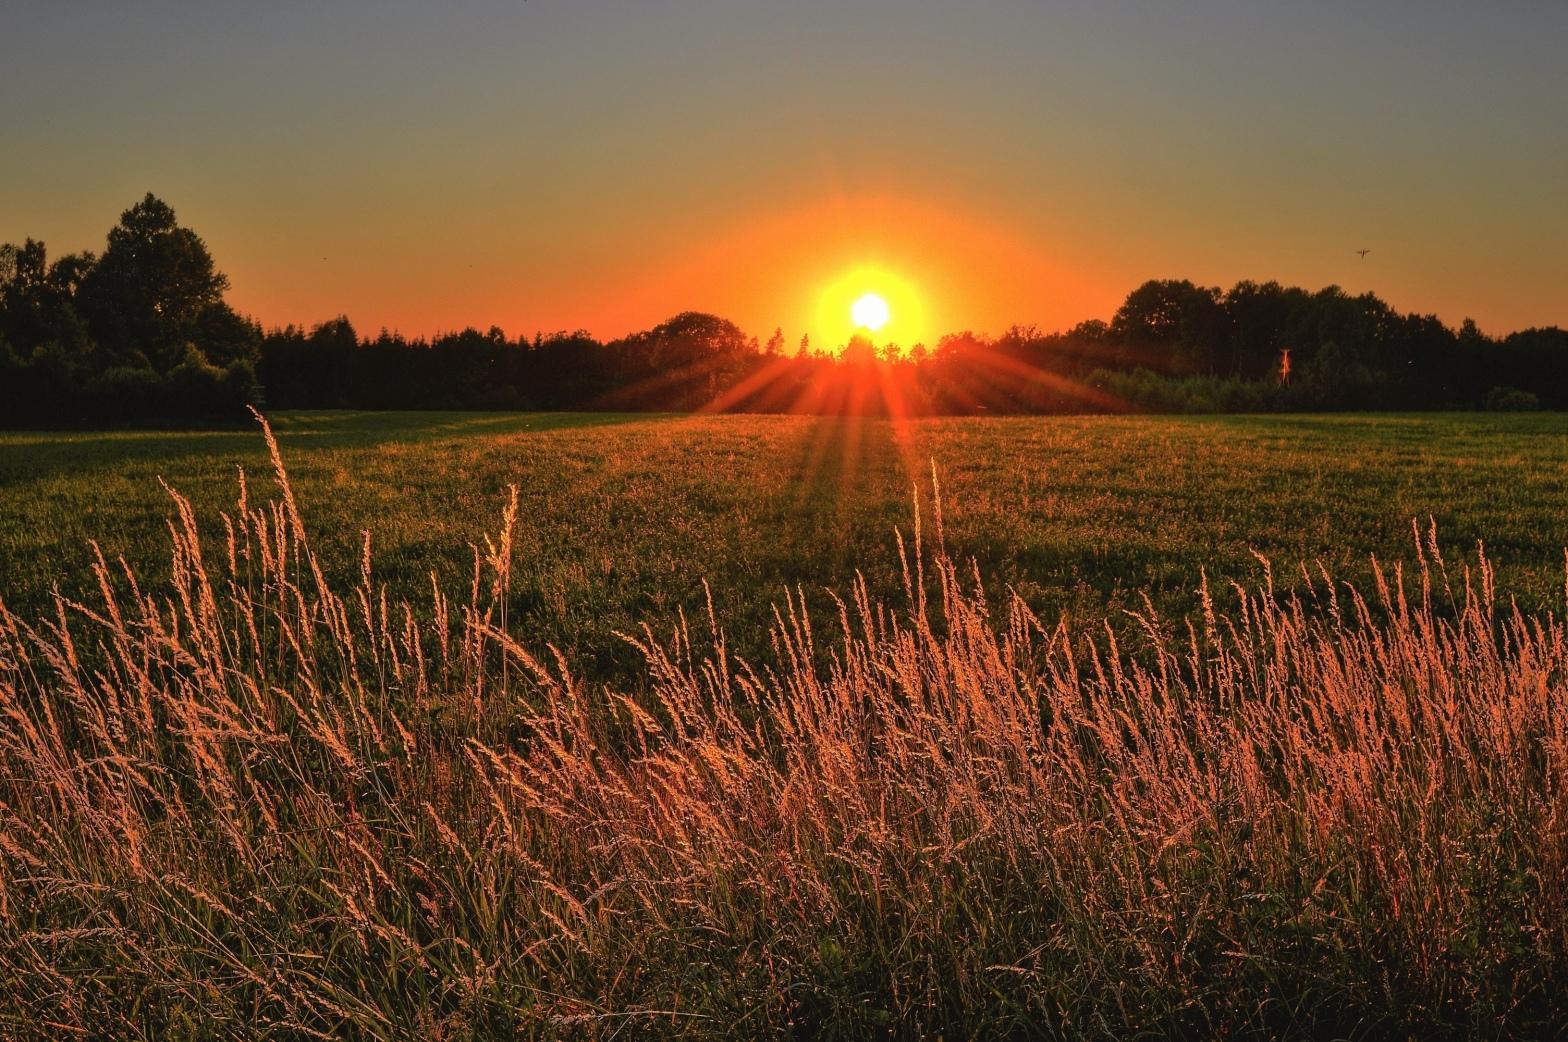 Sunlight_golden_era